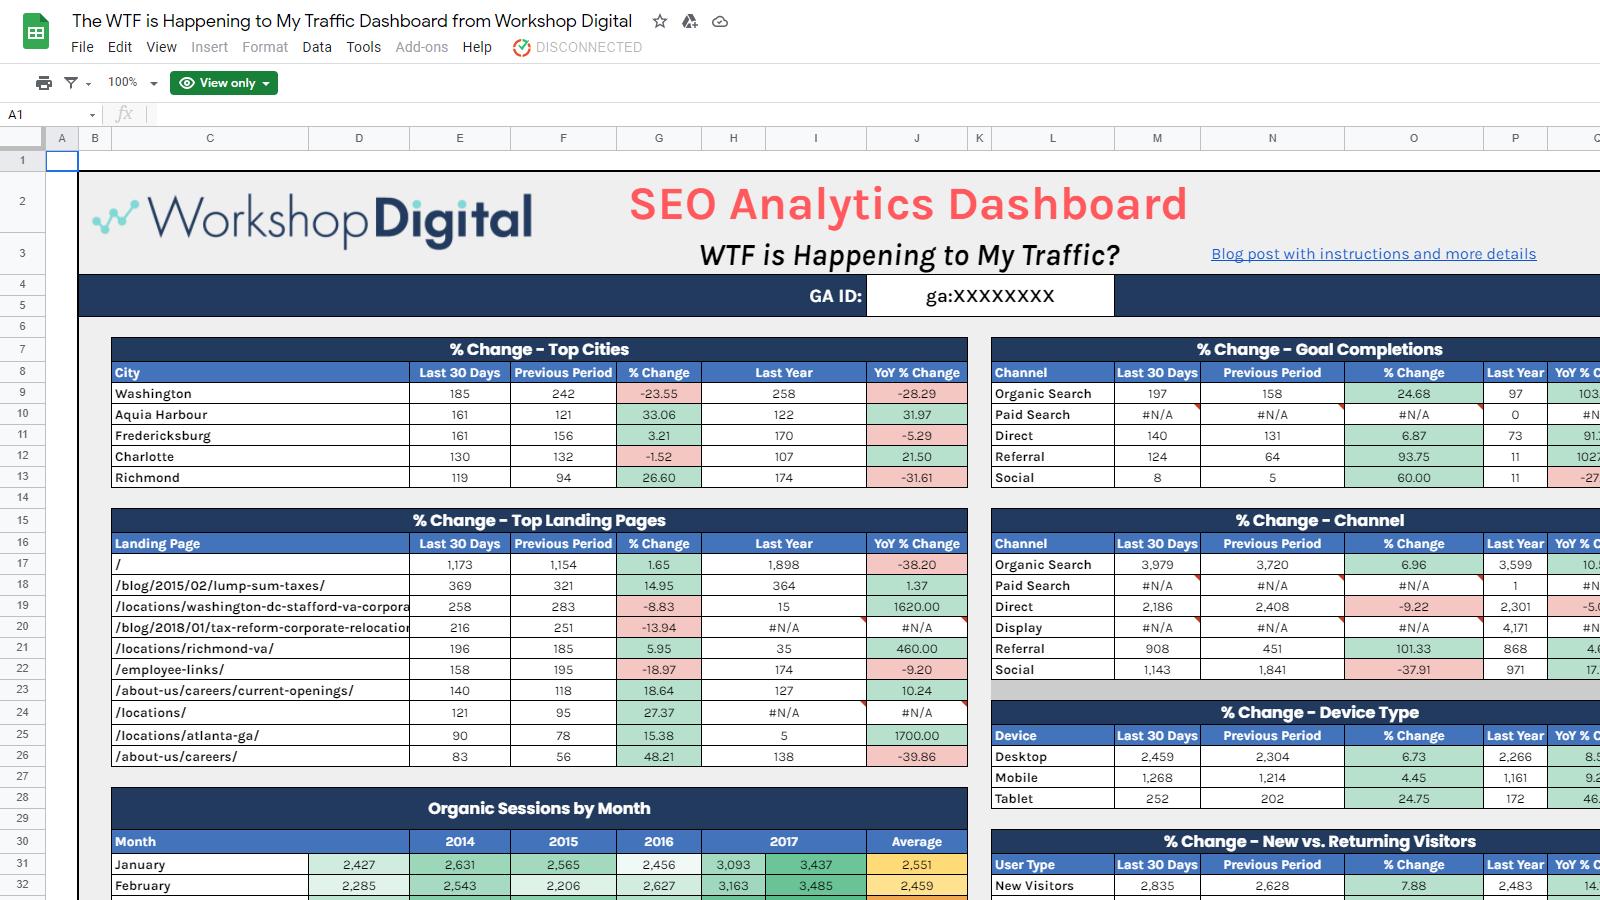 SEO Analytics Dashboard